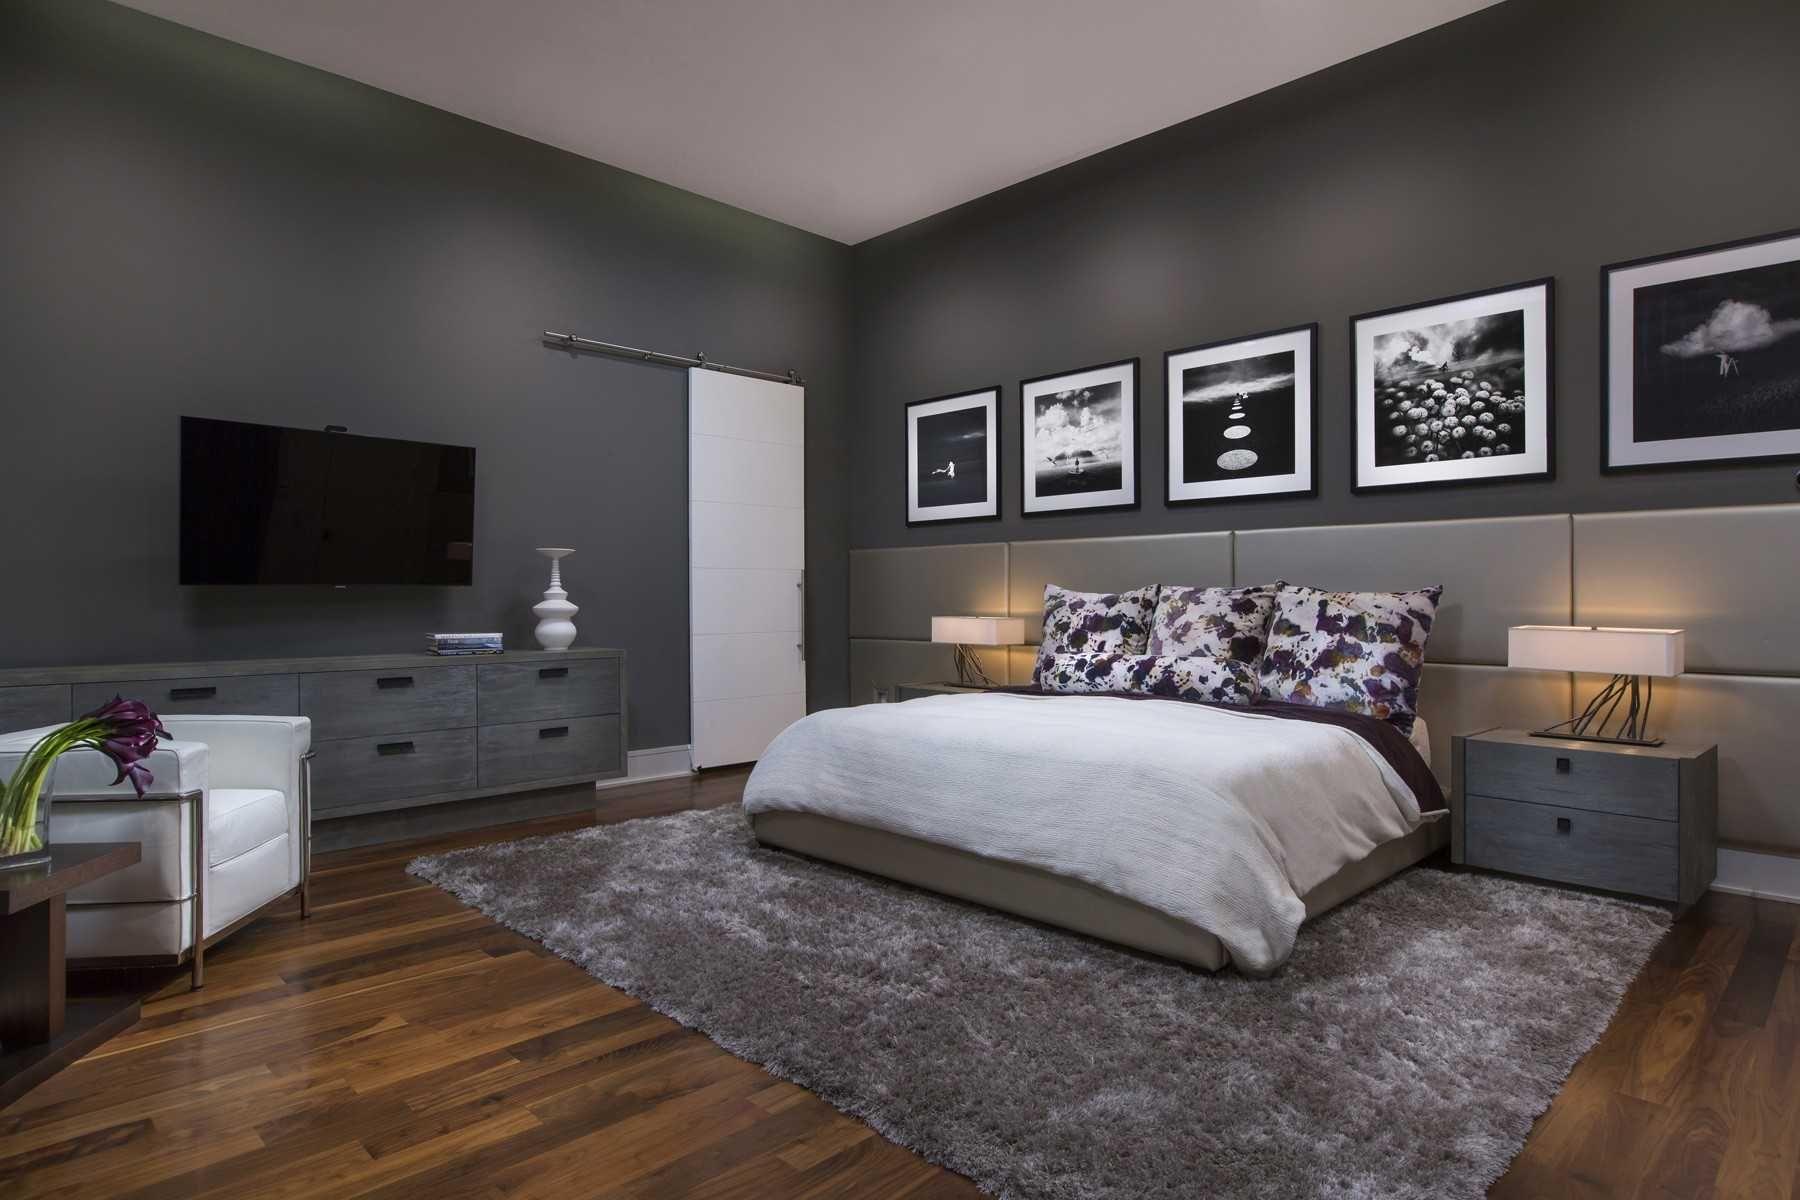 احدث الوان غرف نوم مودرن 2019 modern bedrooms 2020 on popular house interior paint colors id=95257